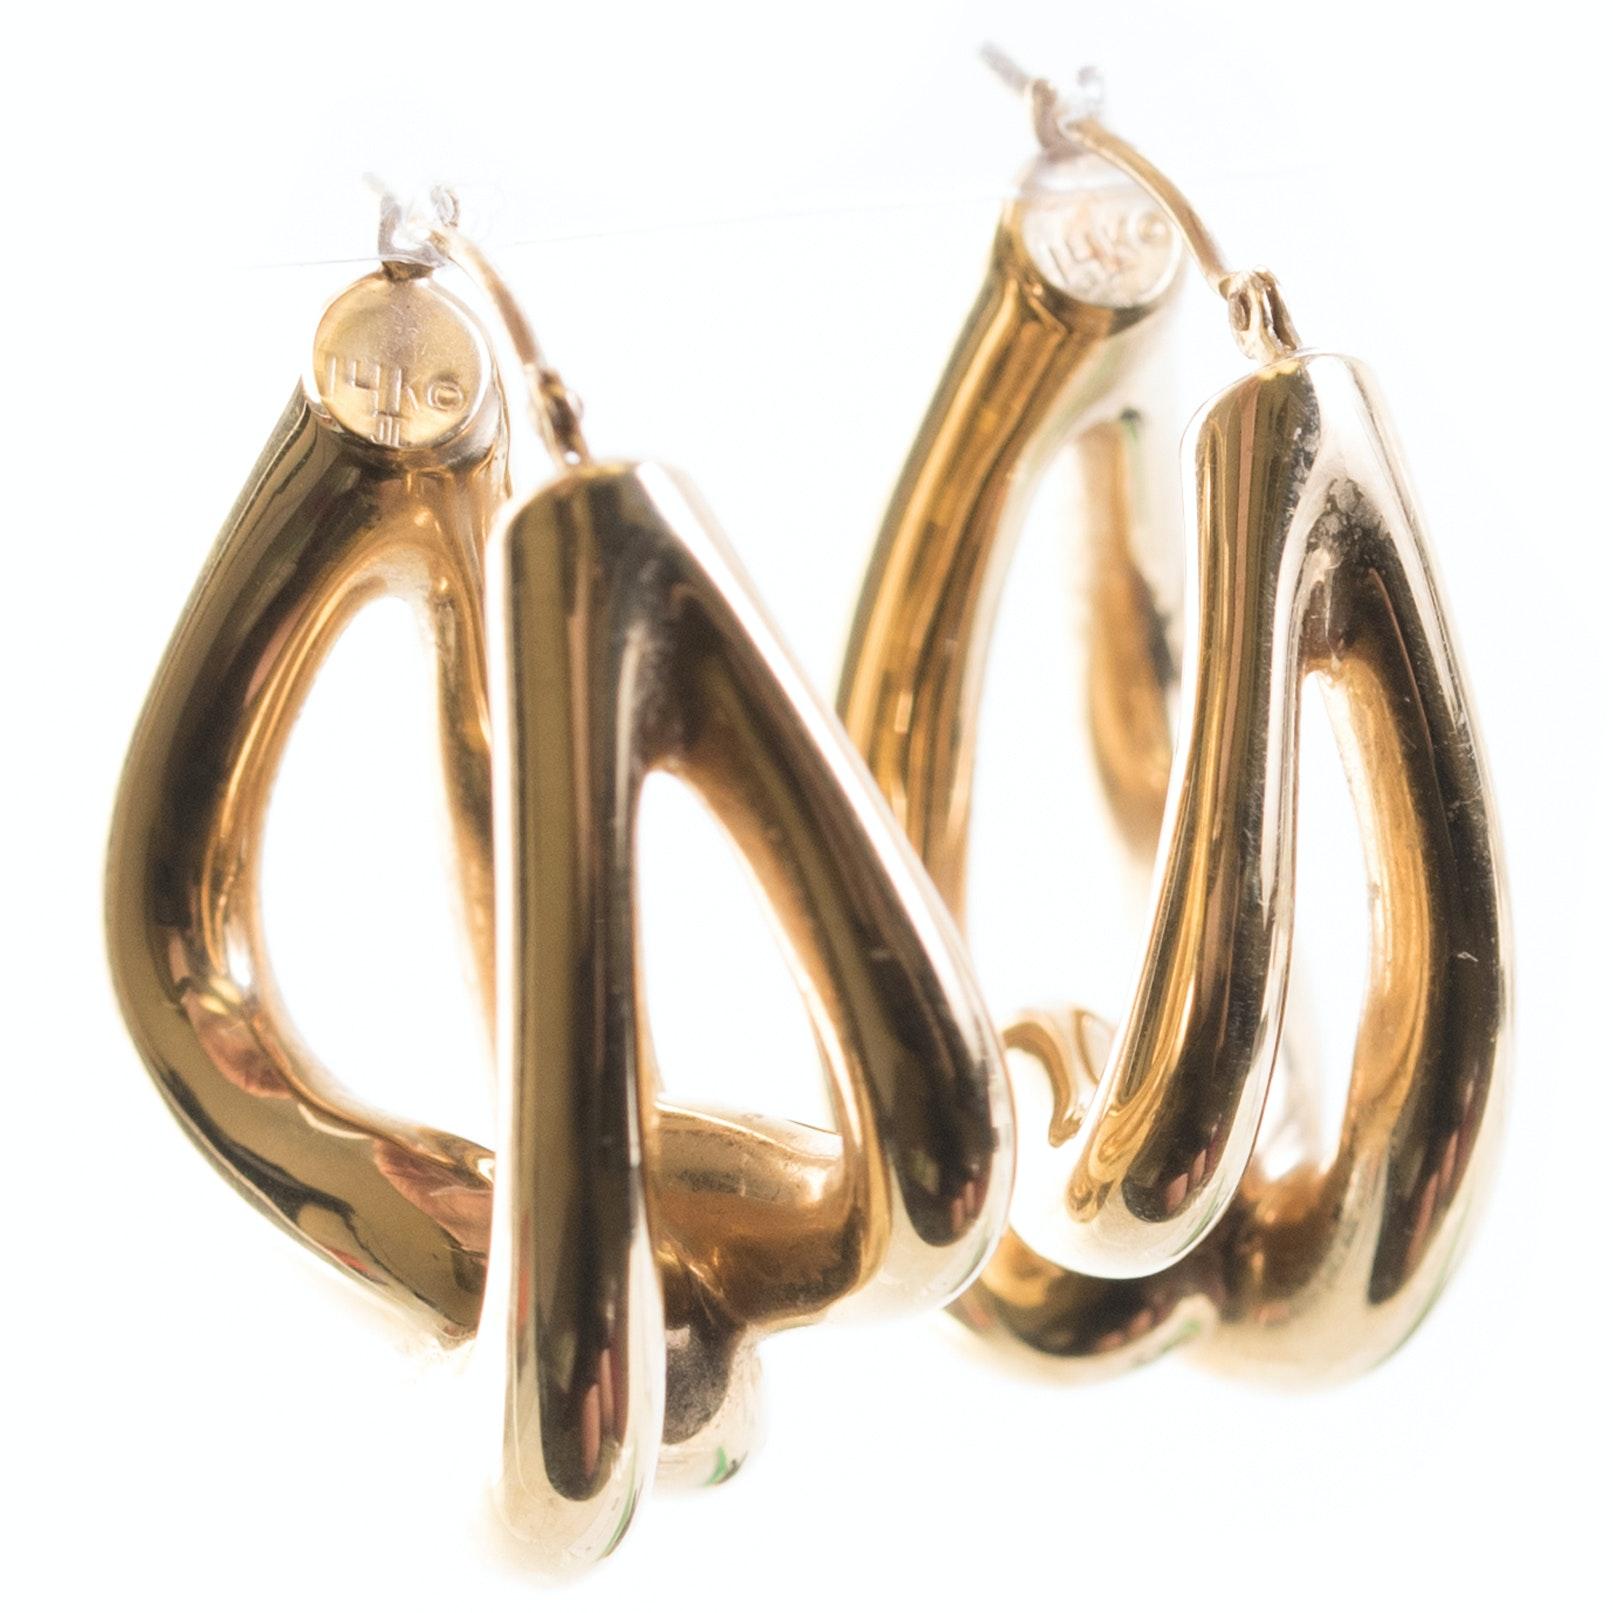 14K Yellow Gold Freeform Hoop Earrings